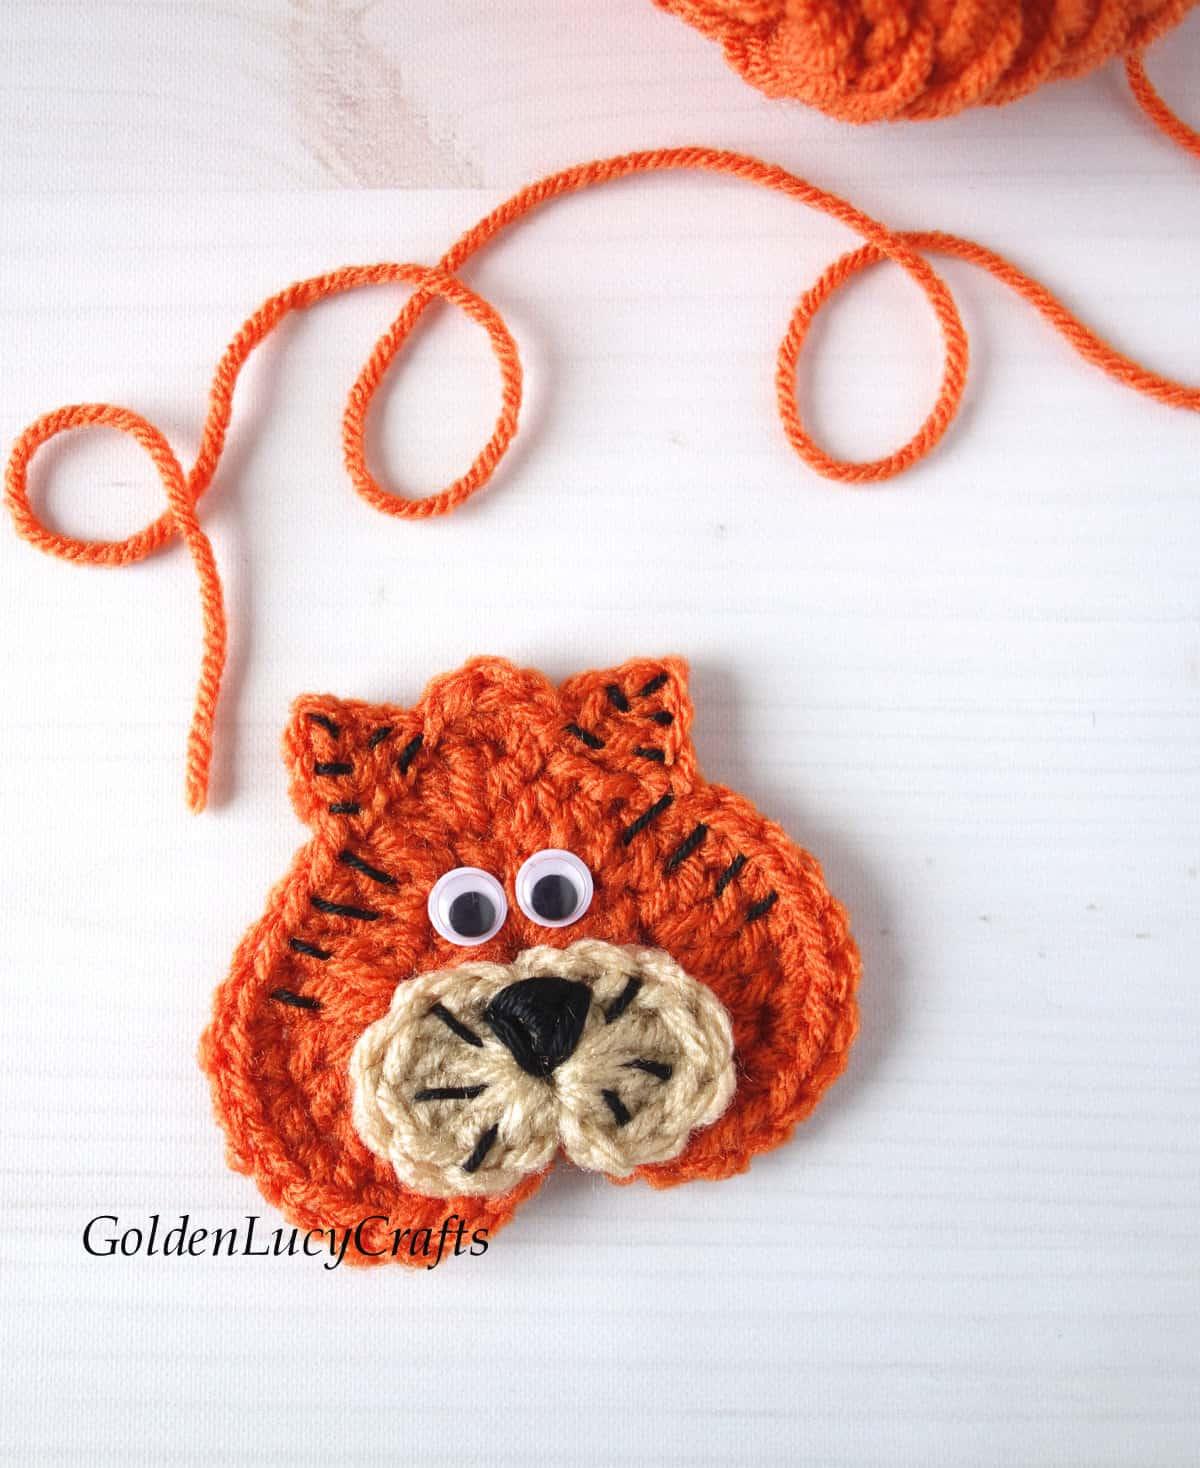 Crochet heart-shaped tiger applique.